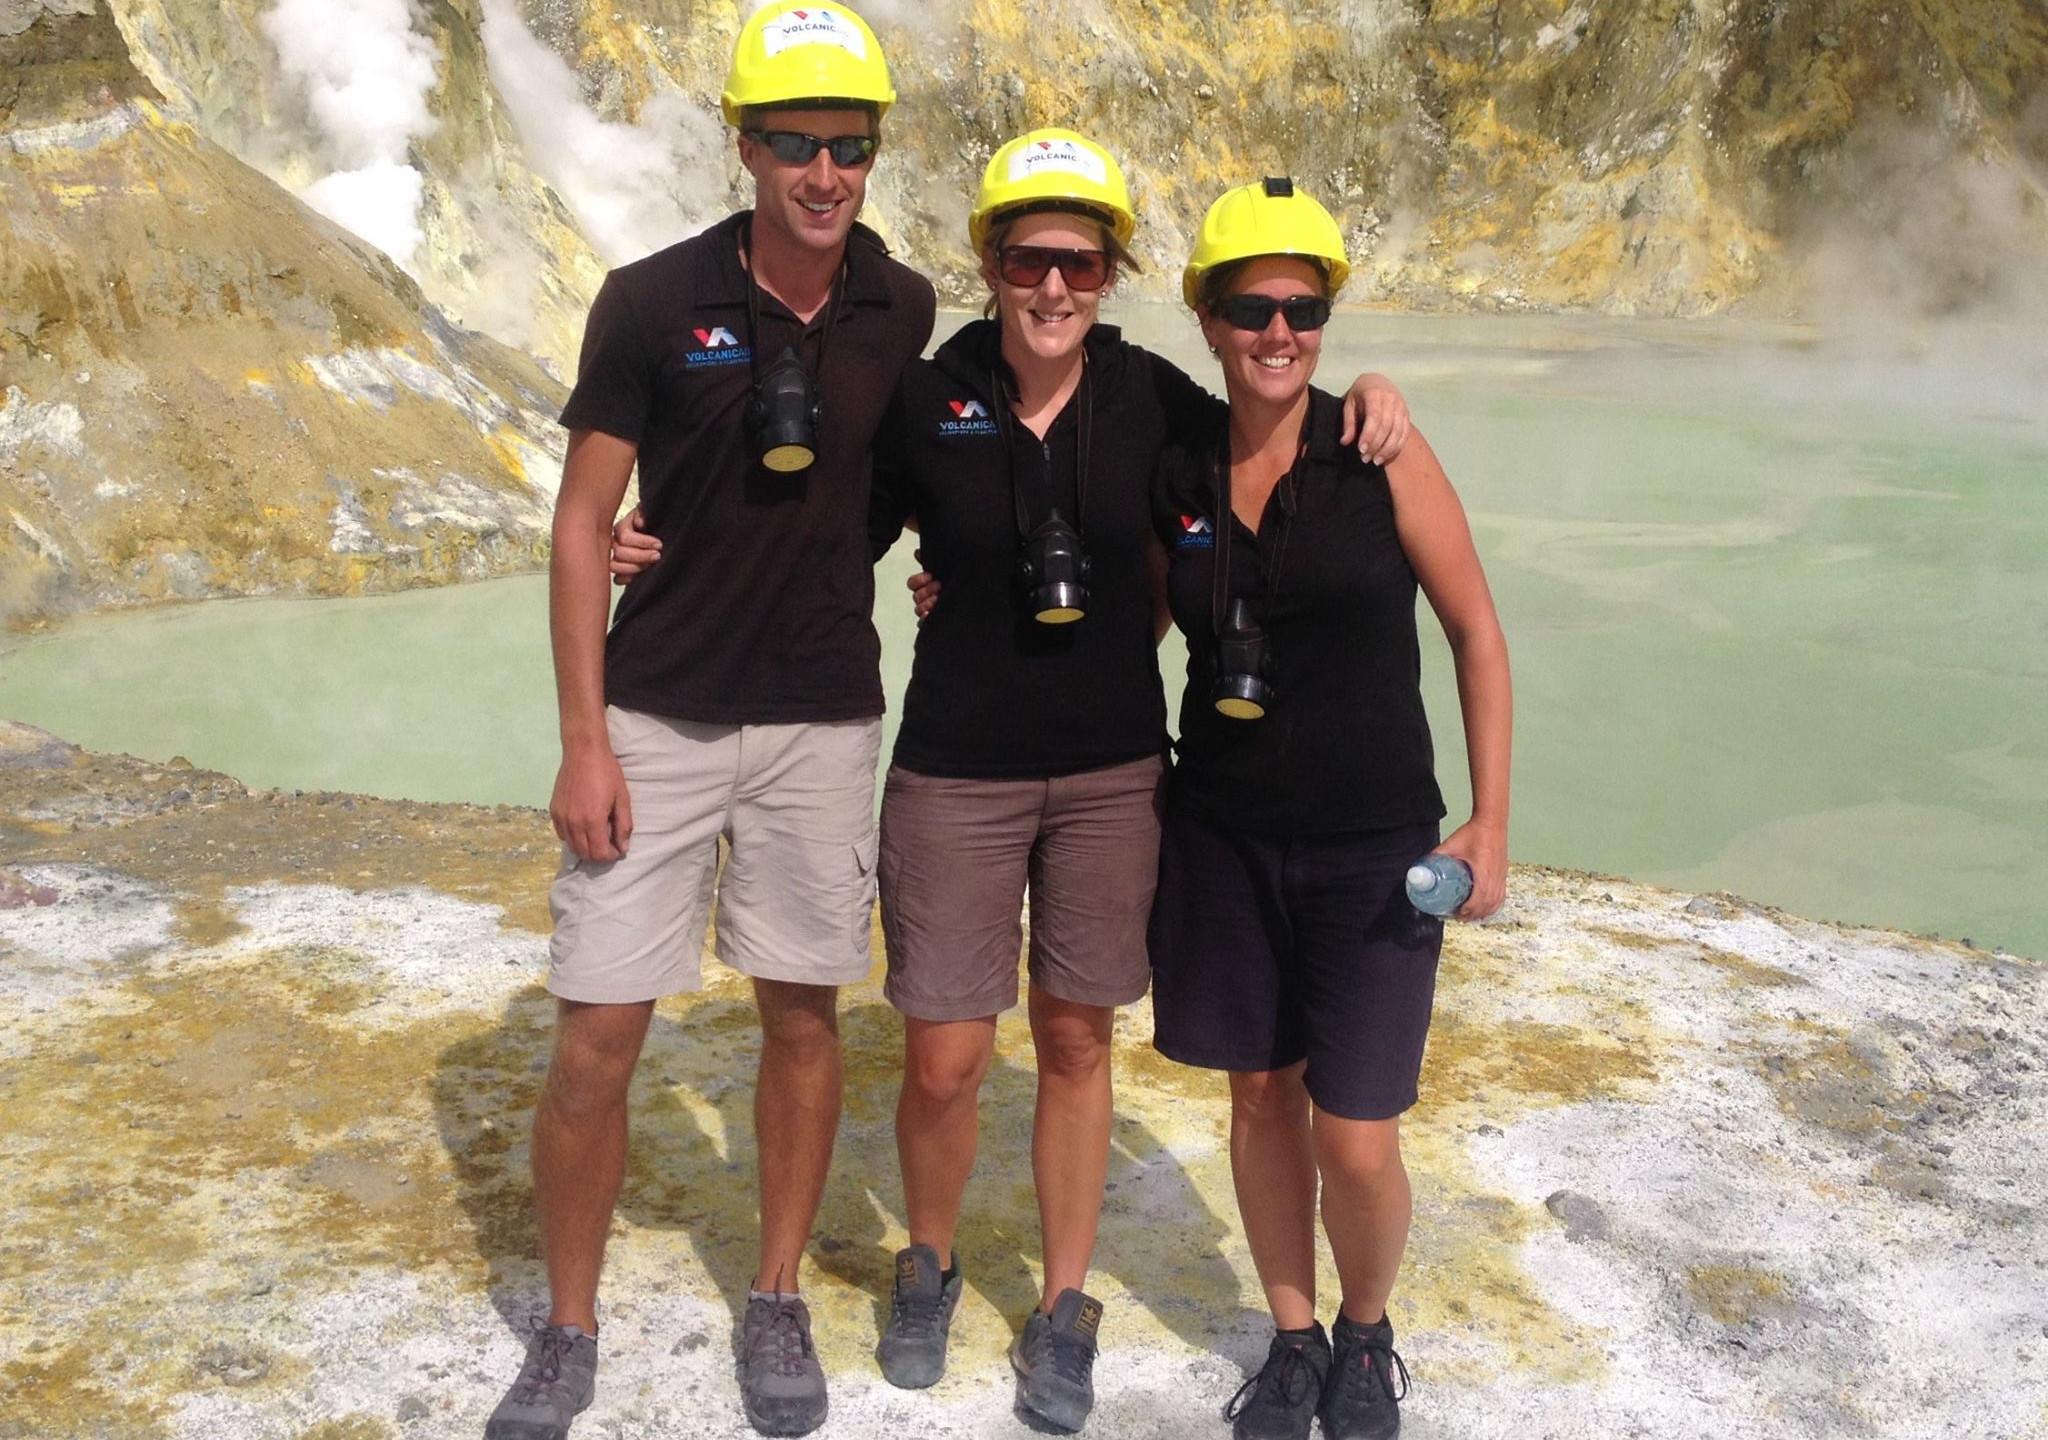 White Island, New Zealand attractions, New Zealand activities